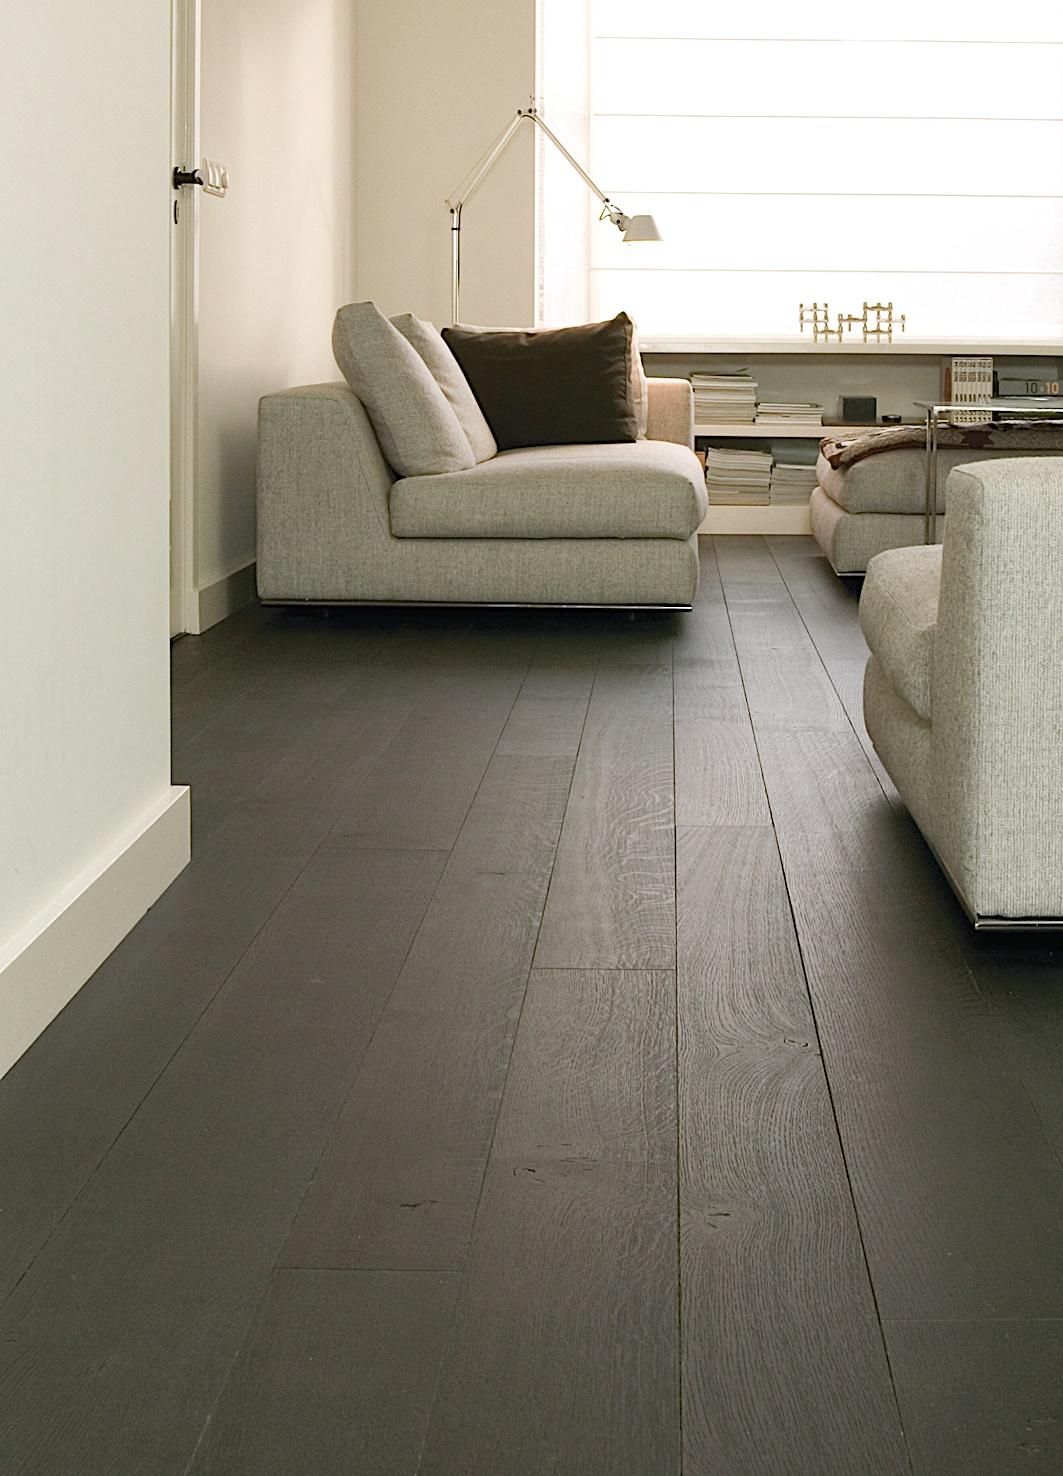 Houtambacht houten vloer